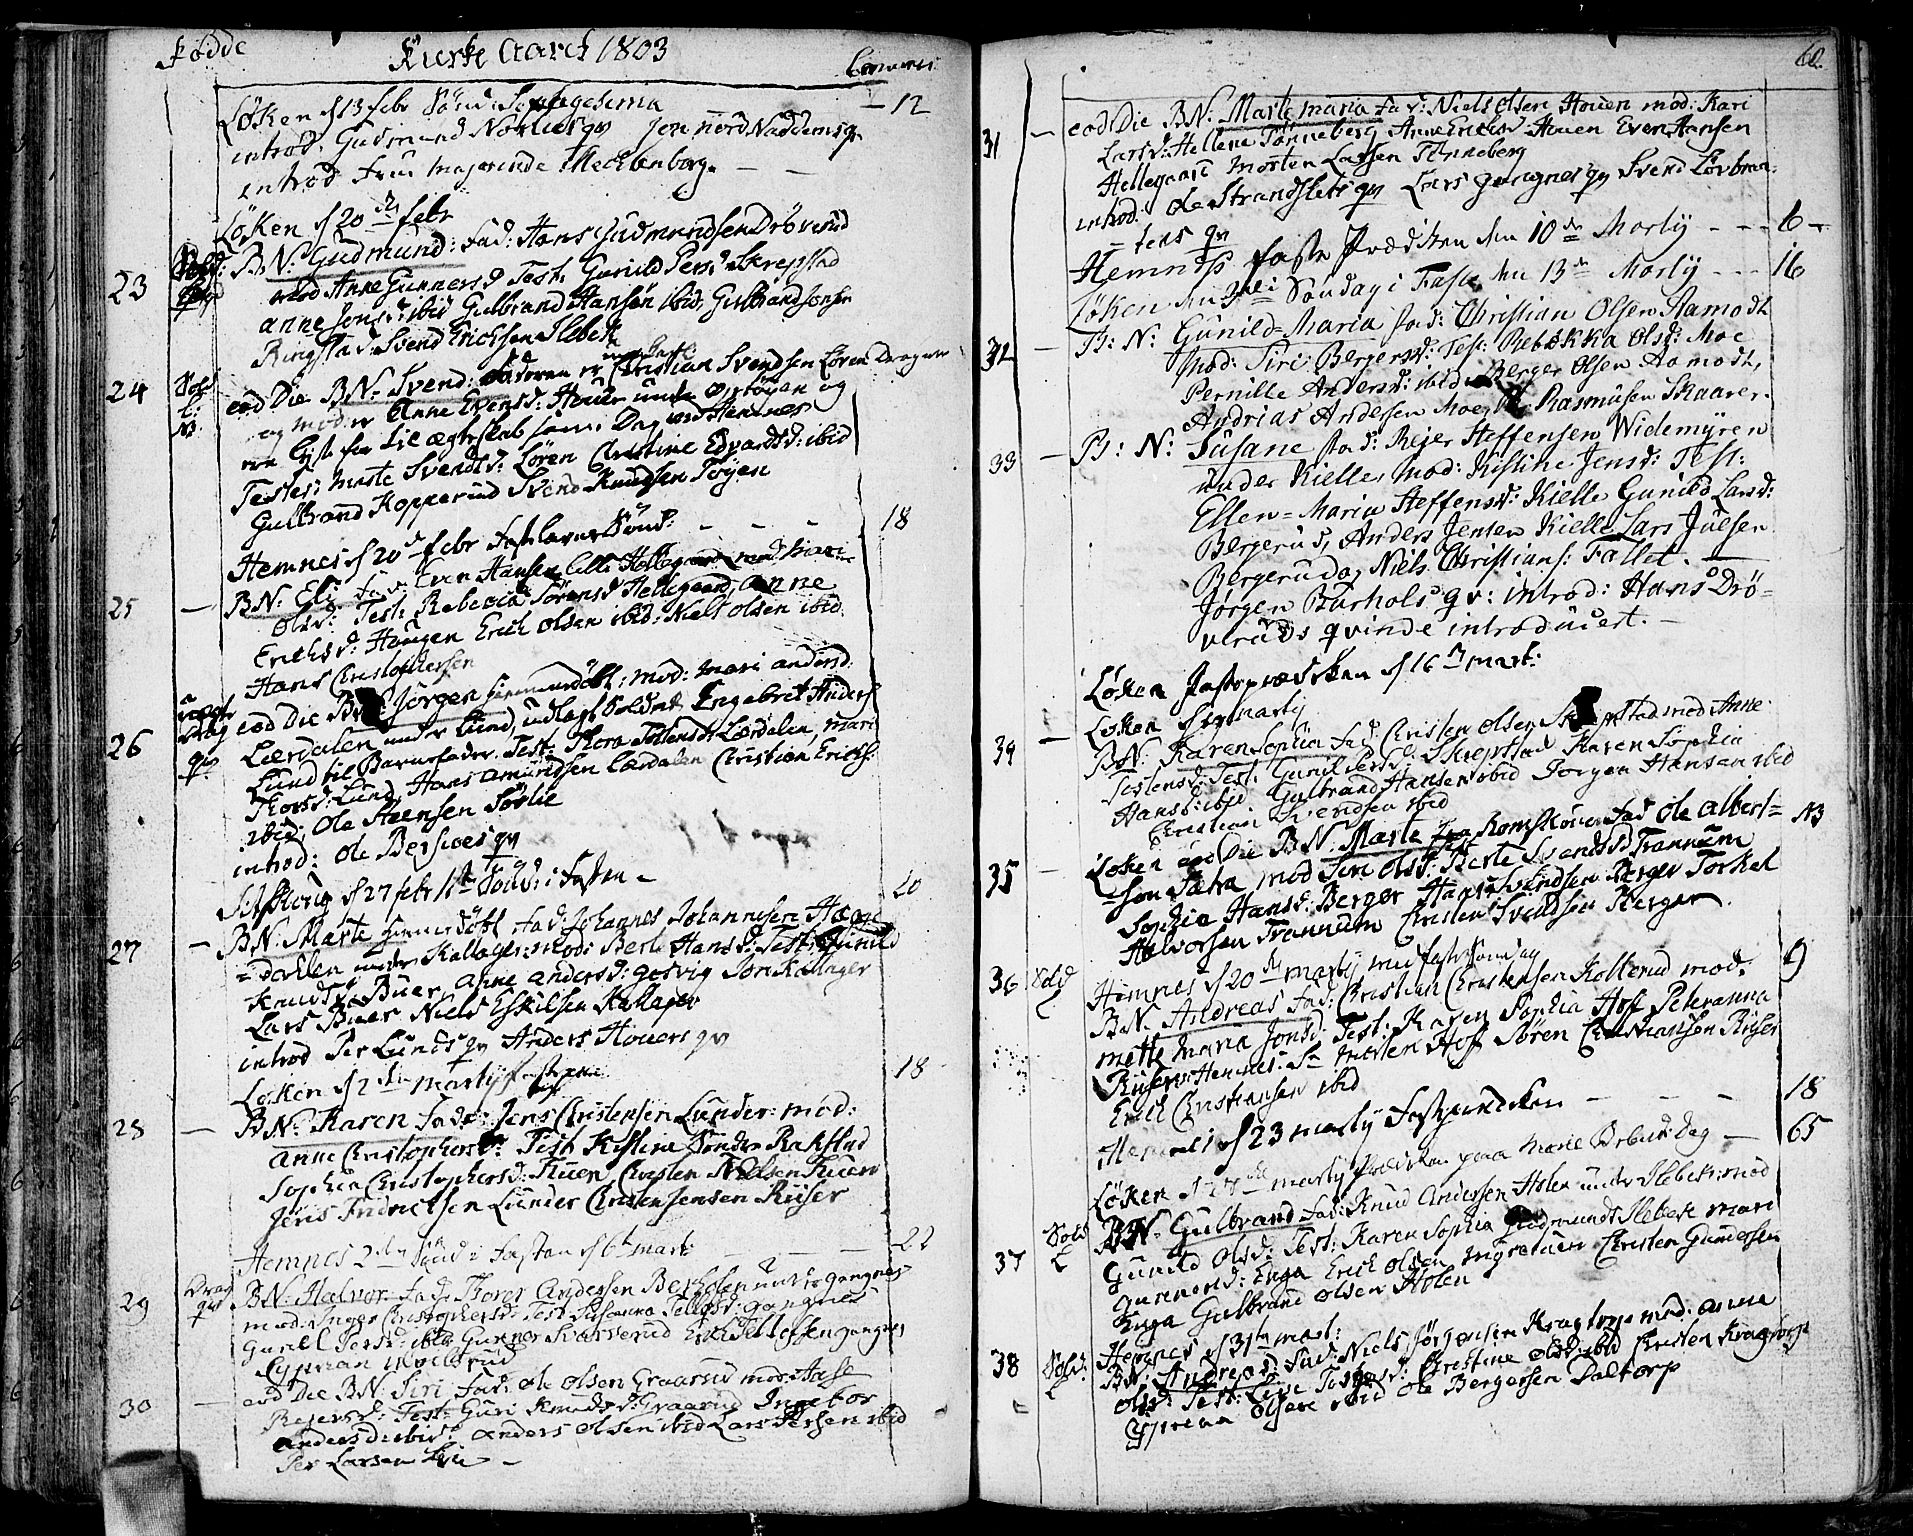 SAO, Høland prestekontor Kirkebøker, F/Fa/L0006: Ministerialbok nr. I 6, 1794-1814, s. 60